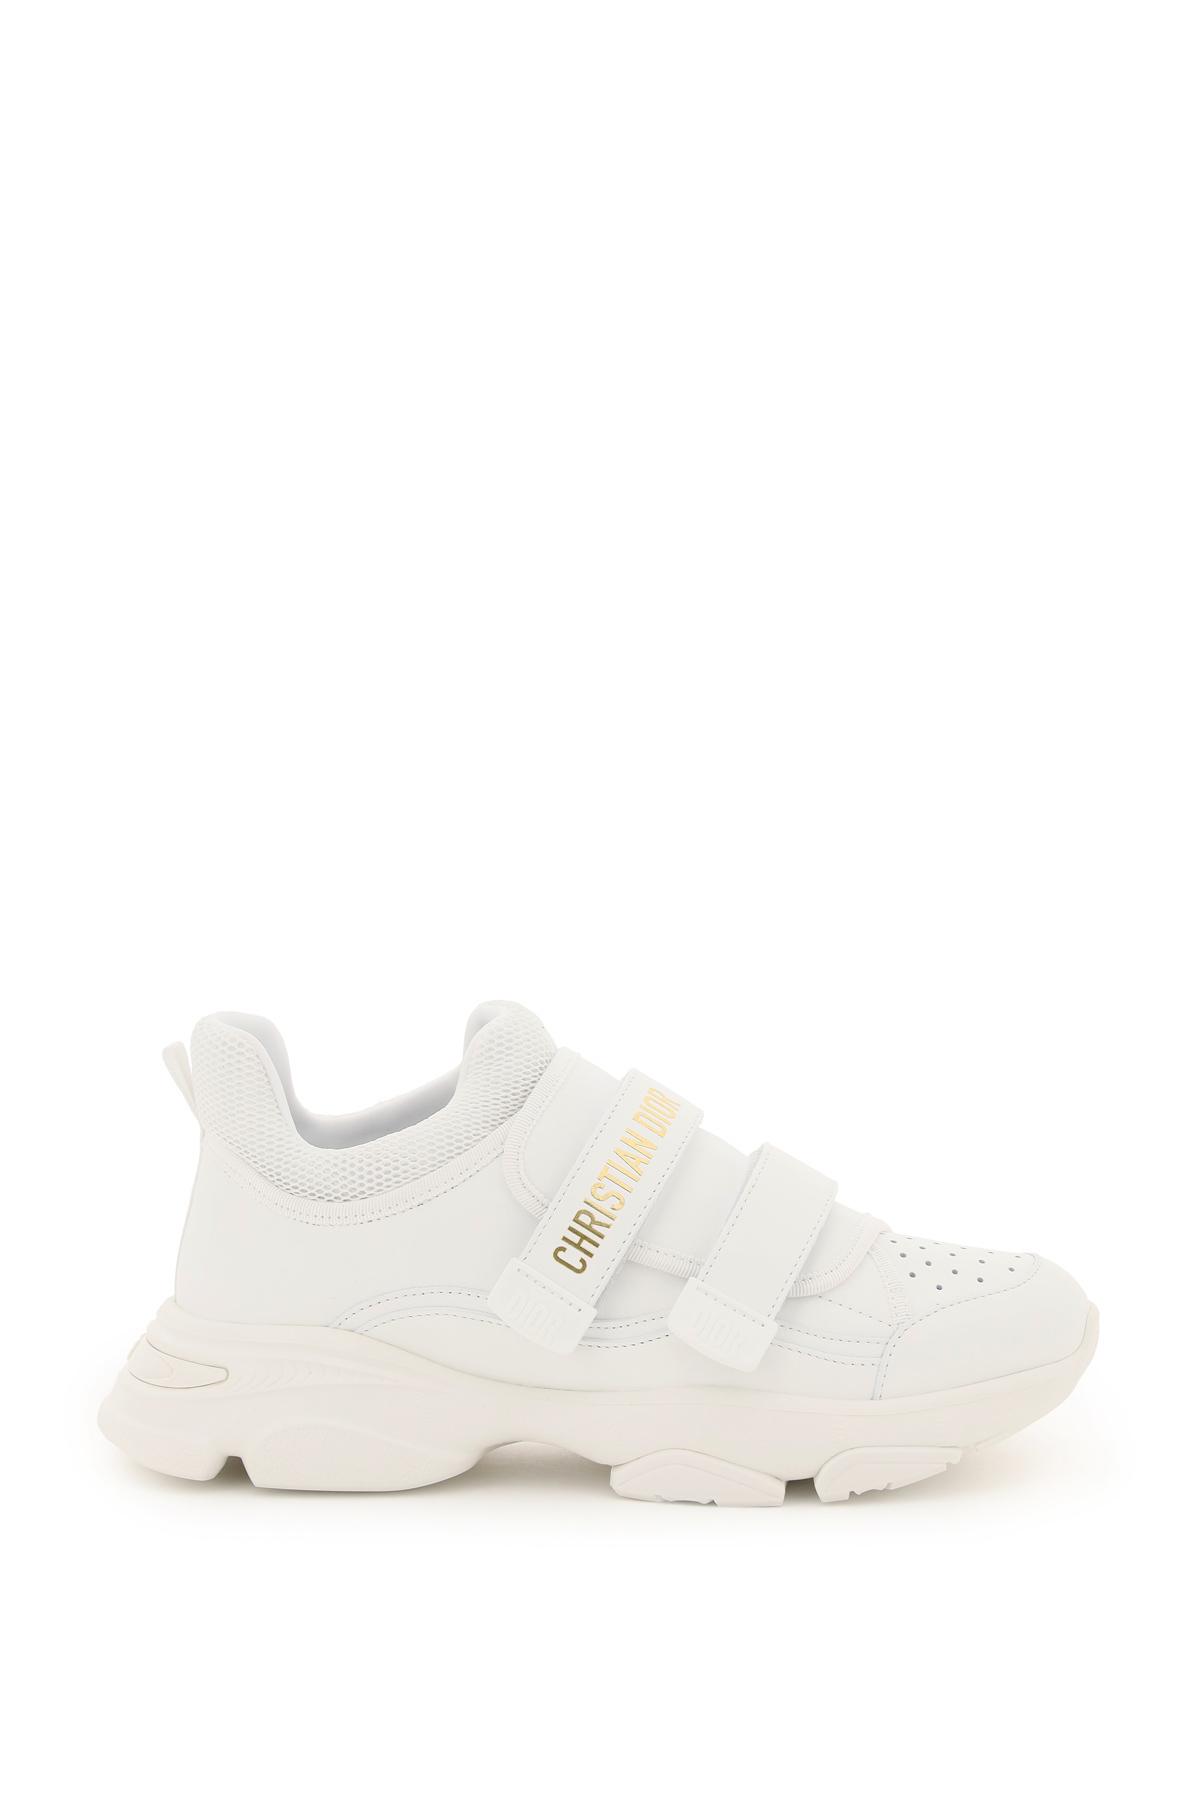 Dior sneakers d-wander